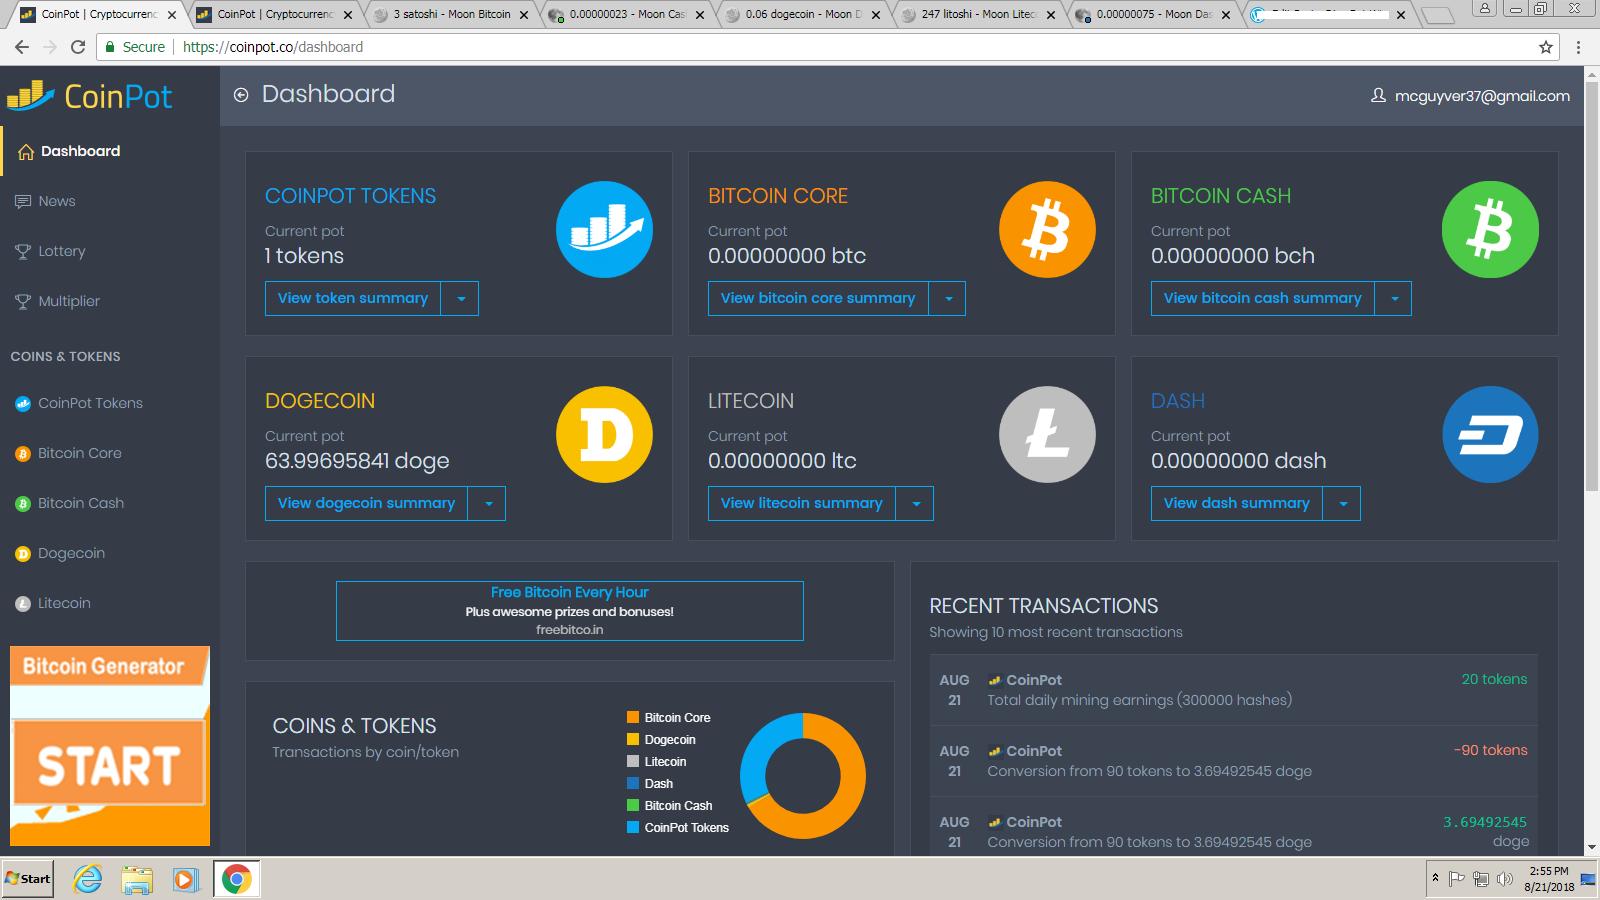 Dogecoin Coinpot Faucet How To Transfer Bitcoin Between